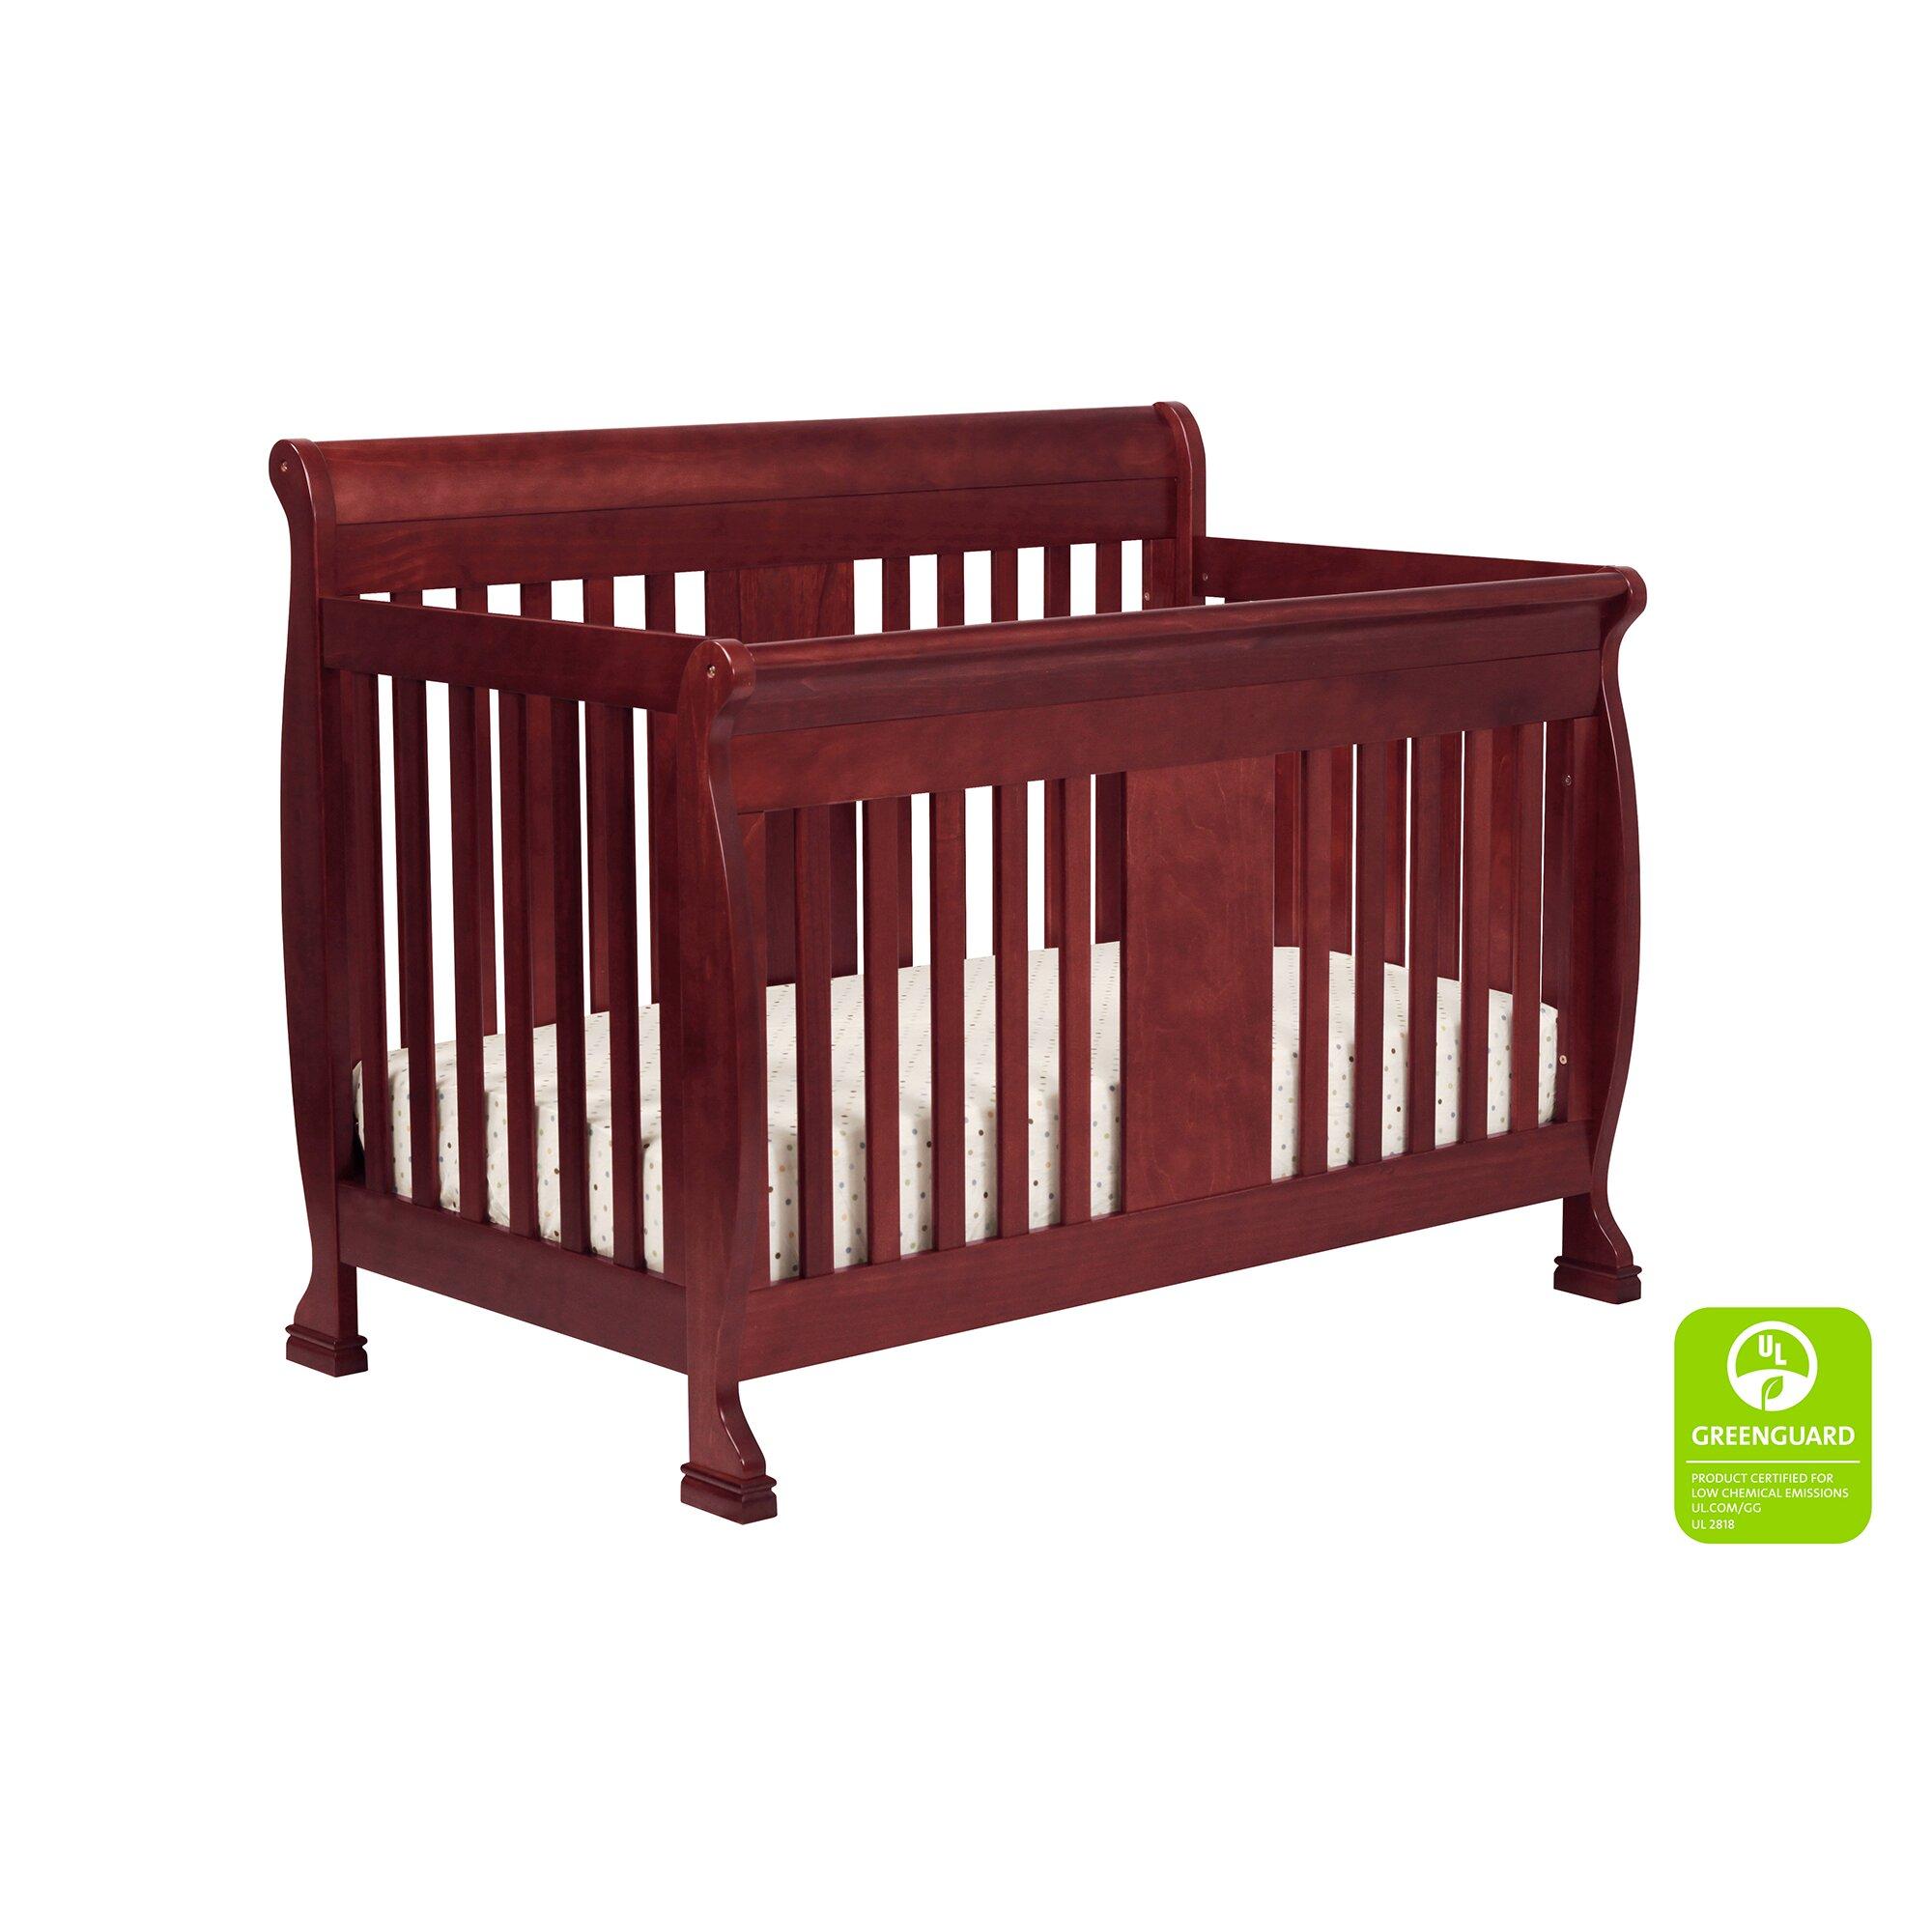 Davinci Porter 4 In 1 Convertible Crib Reviews Wayfair